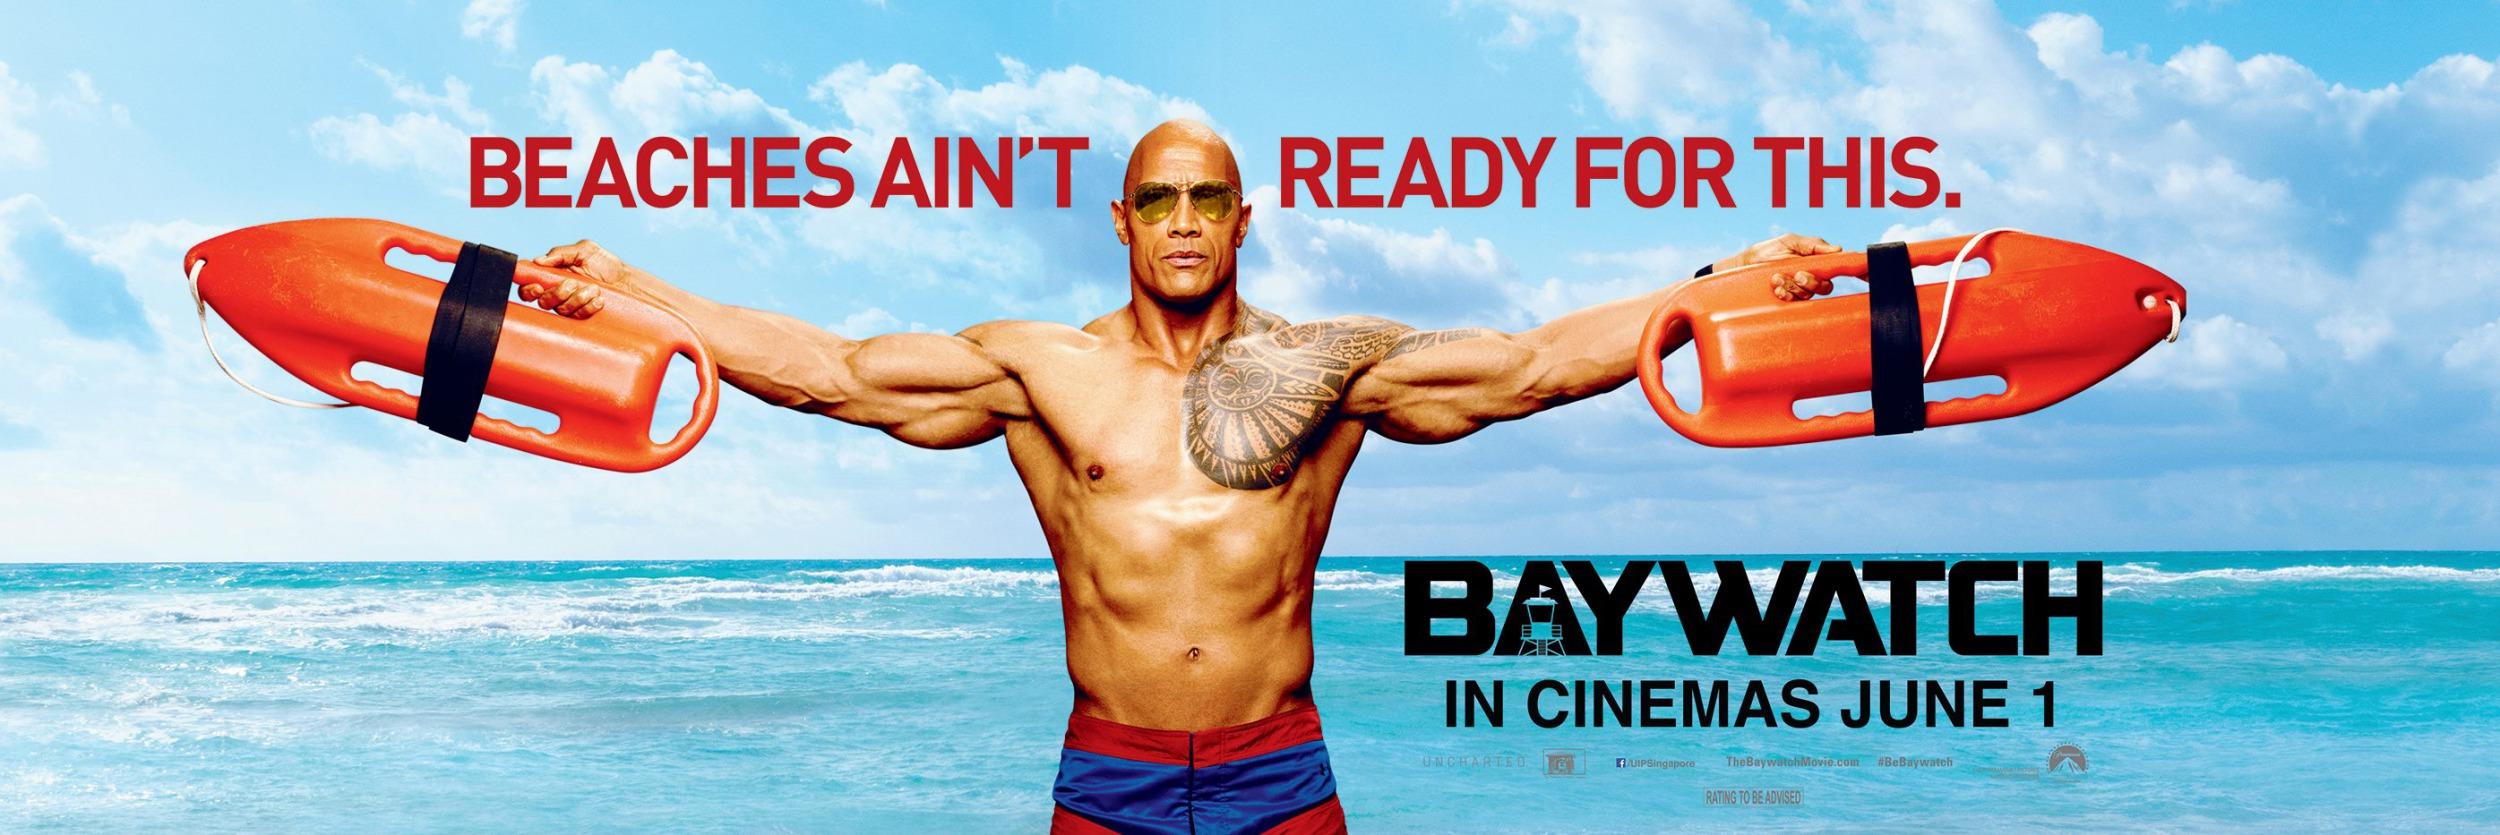 baywatch film - photo #37